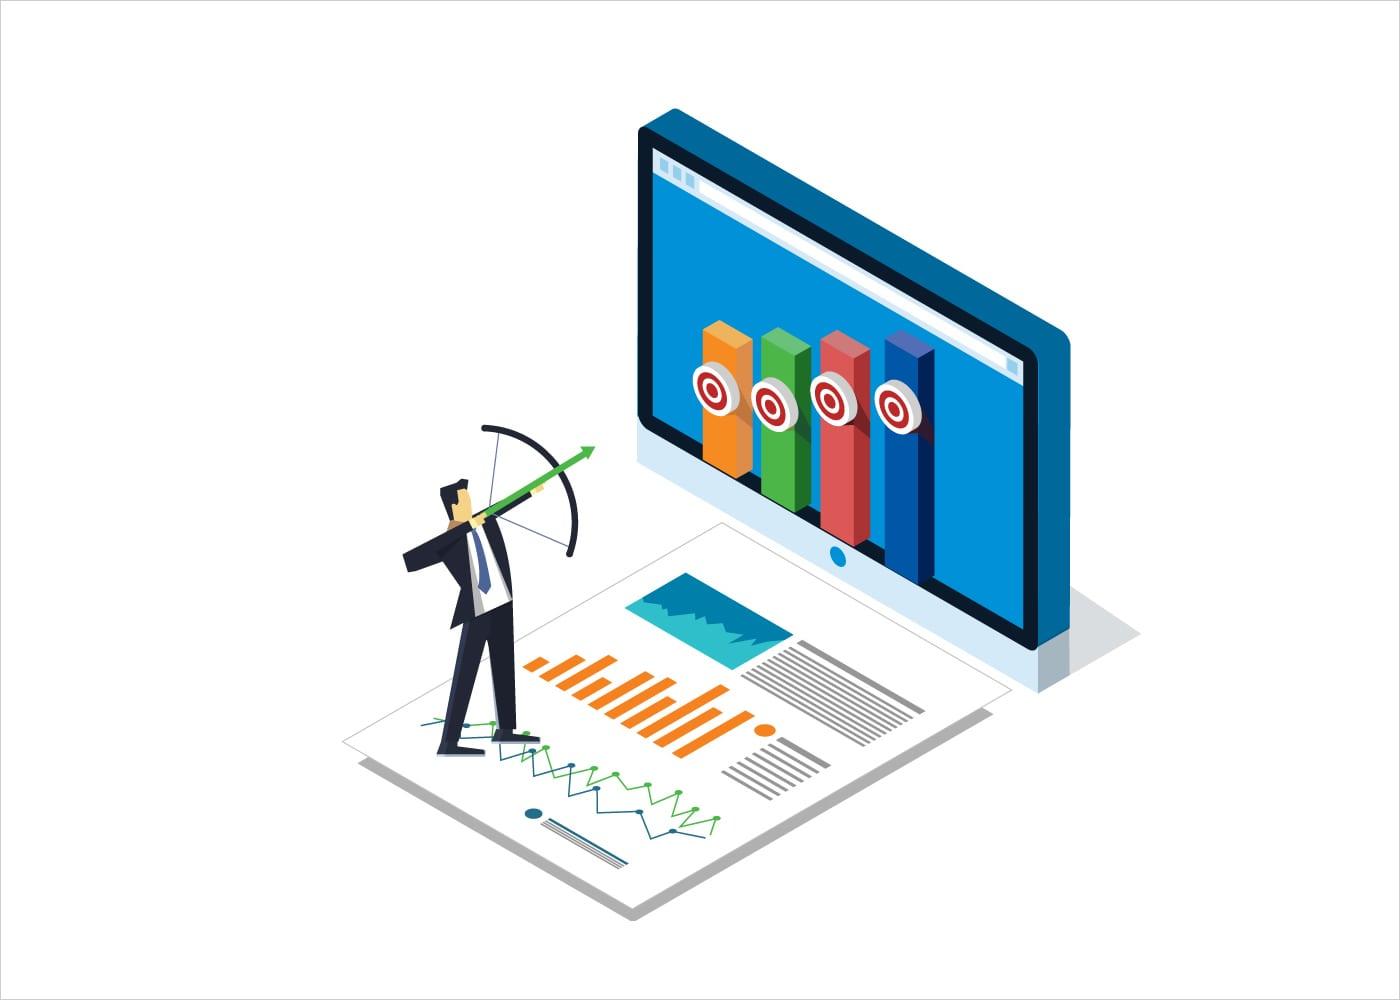 naem-webinar-2018-how-science-based-targets-drive-impact-for-companies-700x500